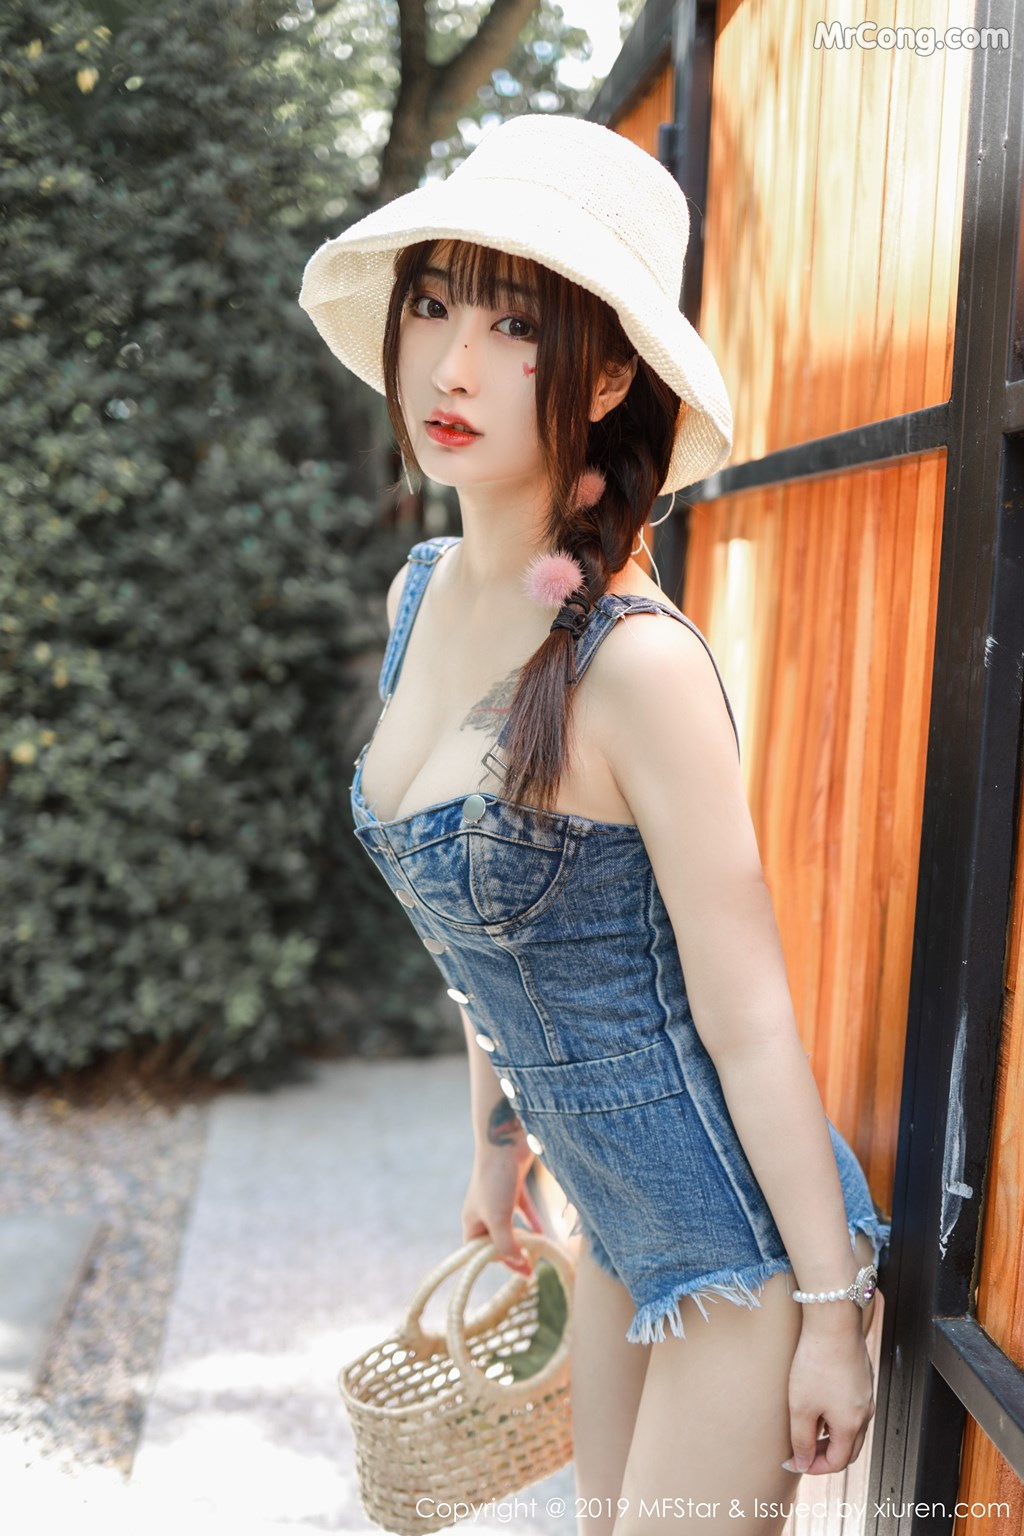 Image MFStar-Vol.228-Betty-MrCong.com-003 in post MFStar Vol.228: Betty林子欣 (58 ảnh)